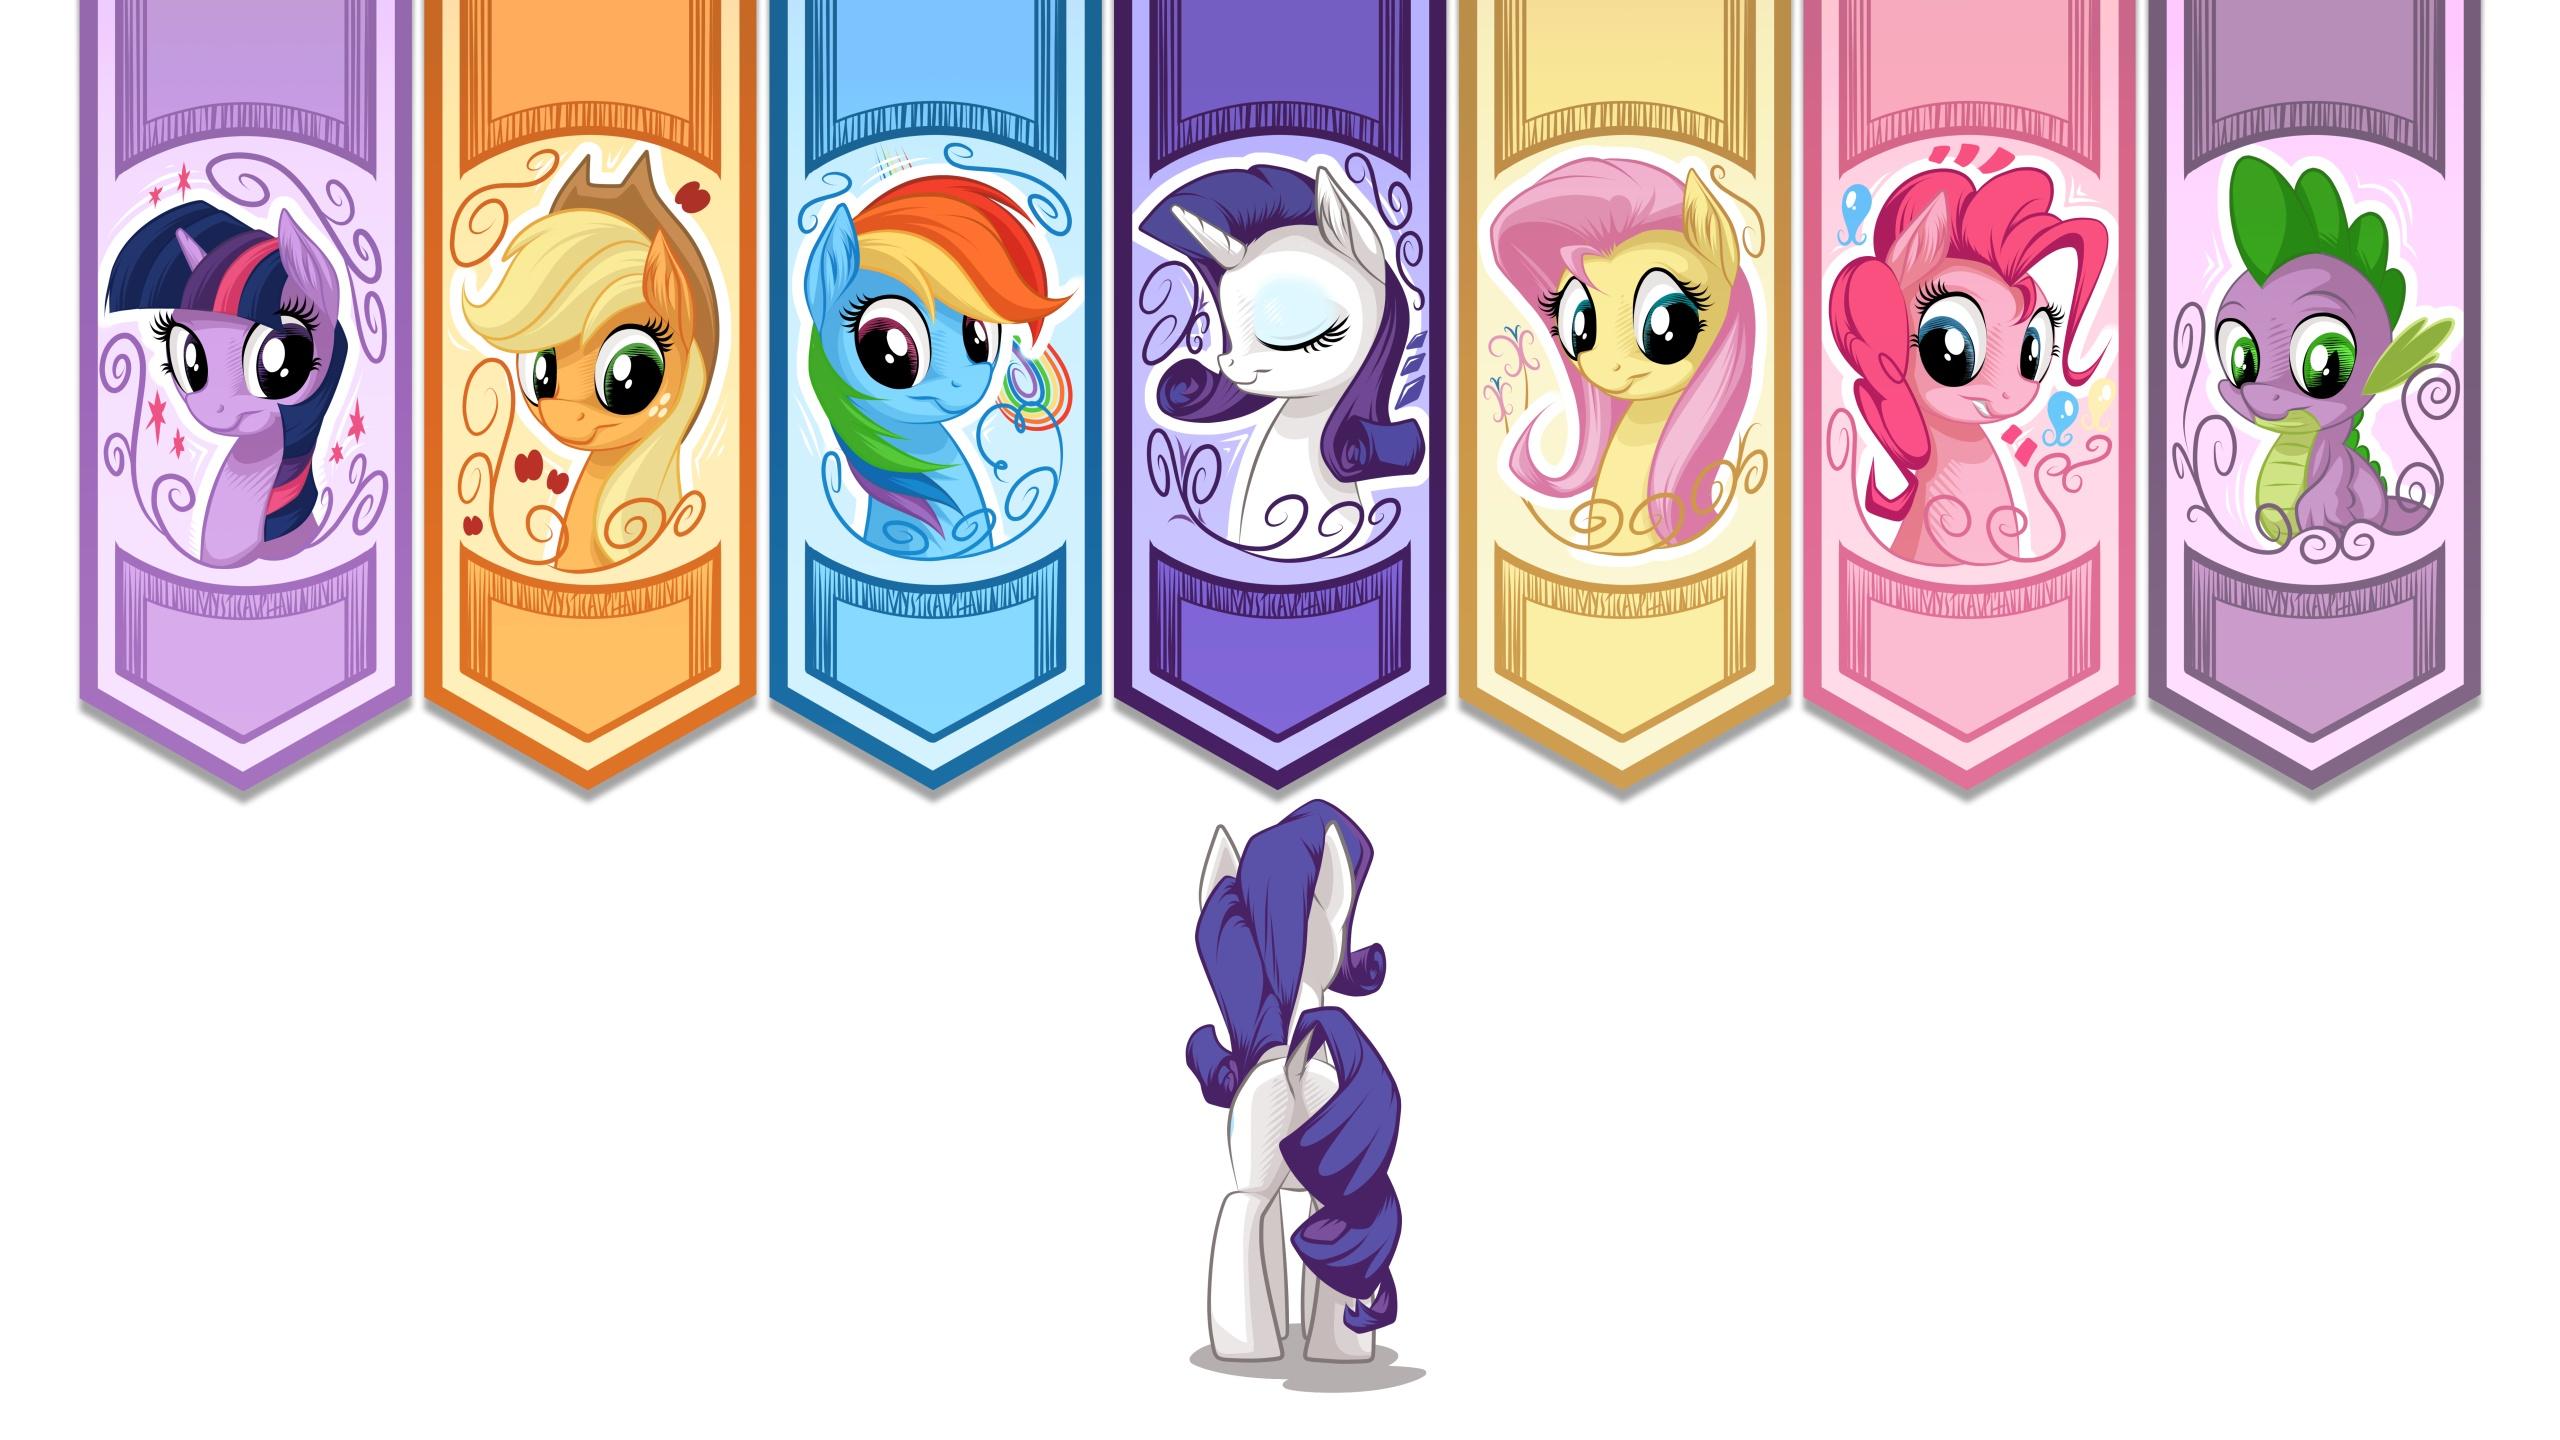 My Little Pony Equestria Girl Wallpaper Hd My Little Pony Arkadaşlık Sihirlidir Hd Duvar Kağıdı